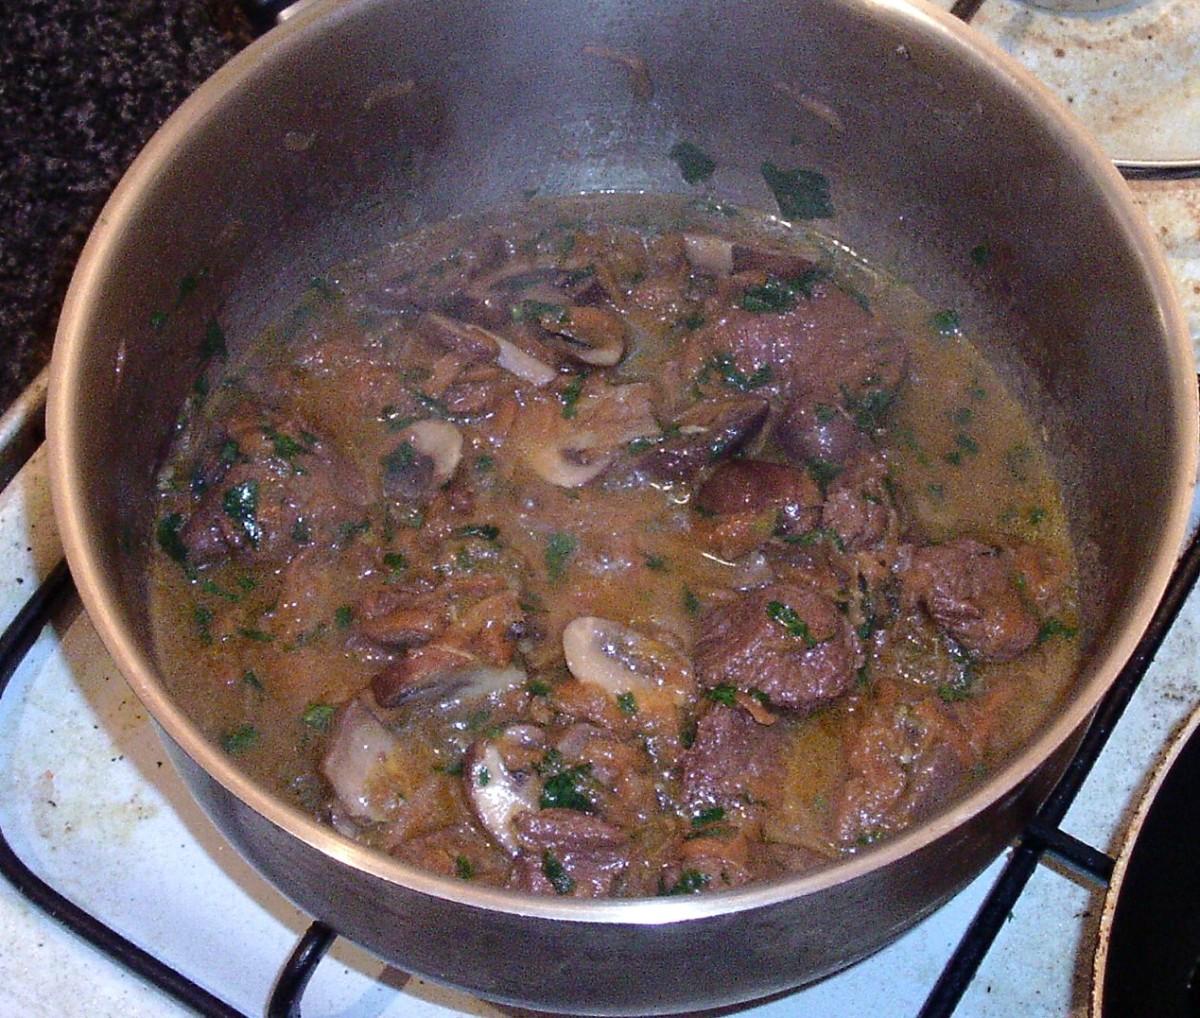 Kangaroo stew is ready to serve